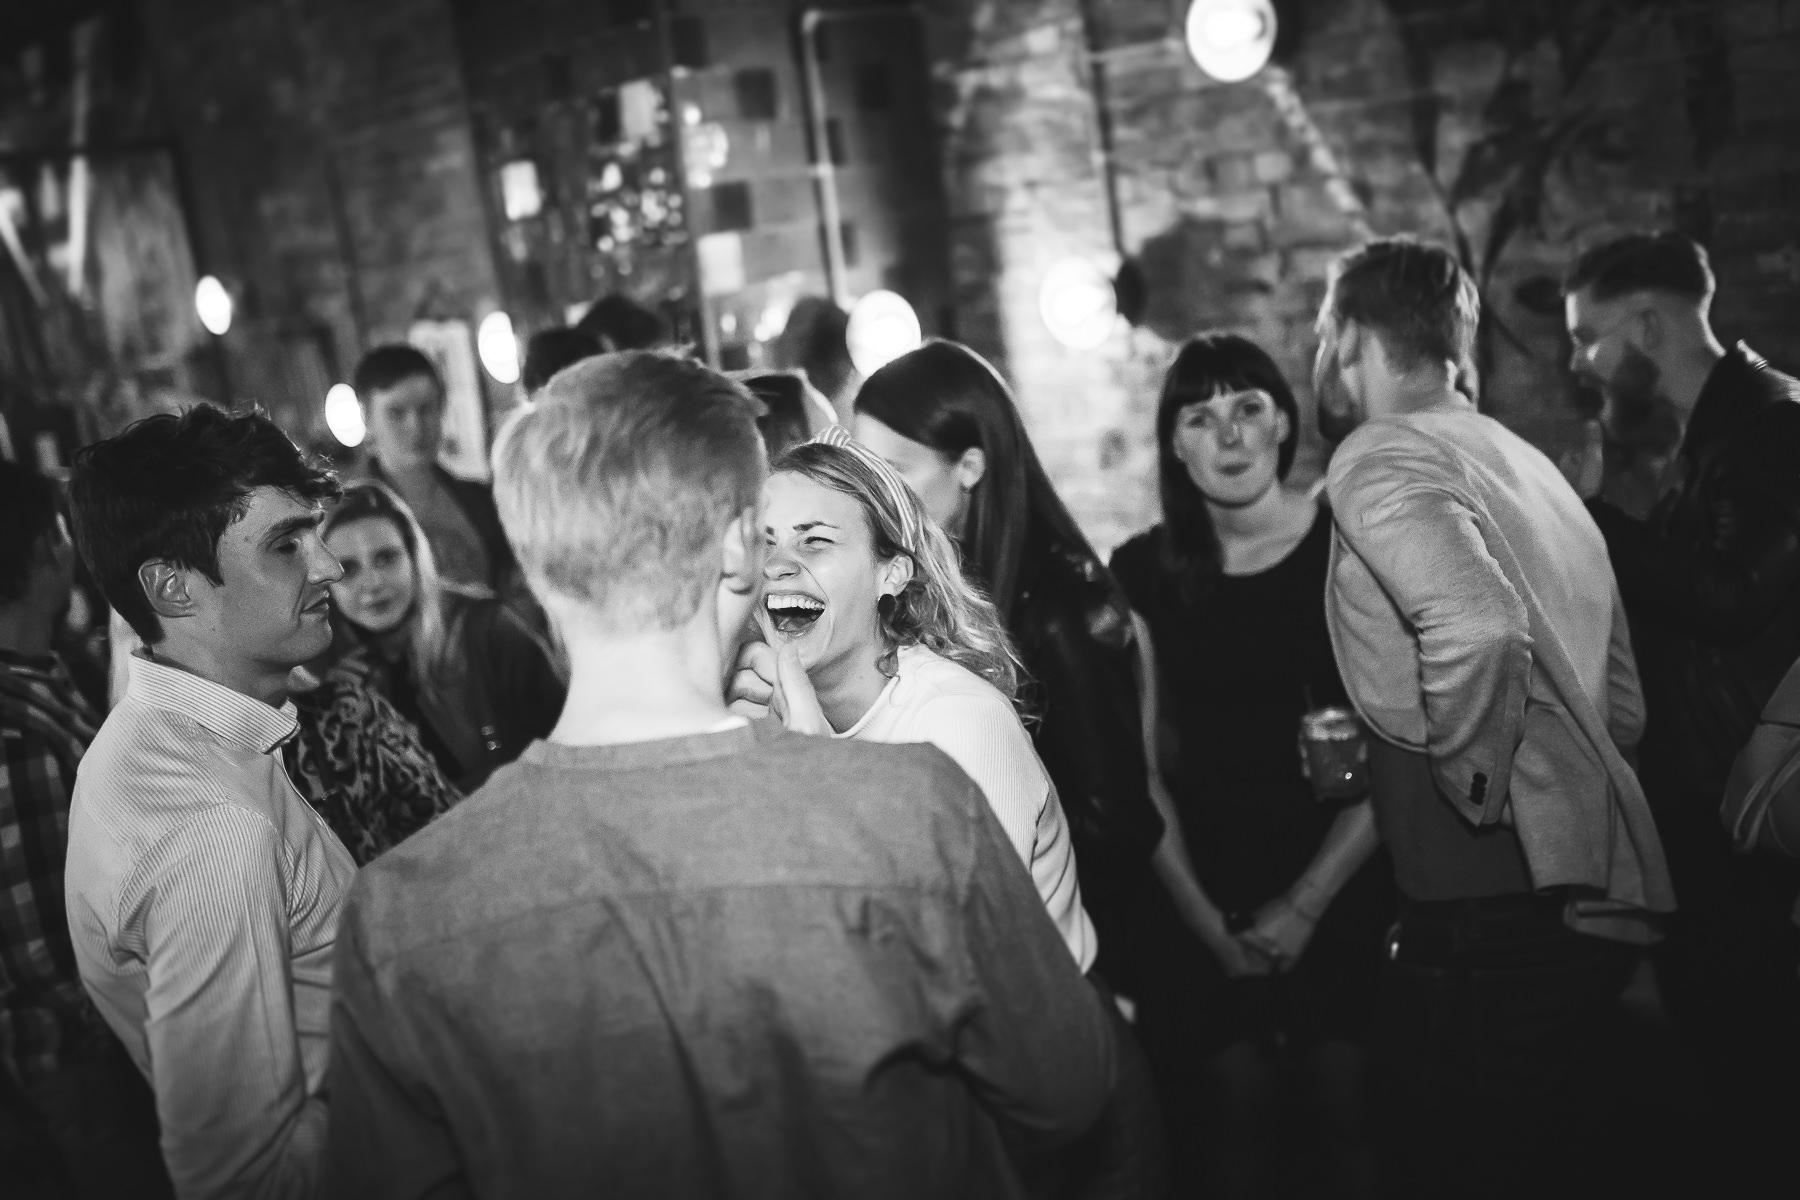 Laughing Girl Black and White Event Photography Ieva Vilcinskaite